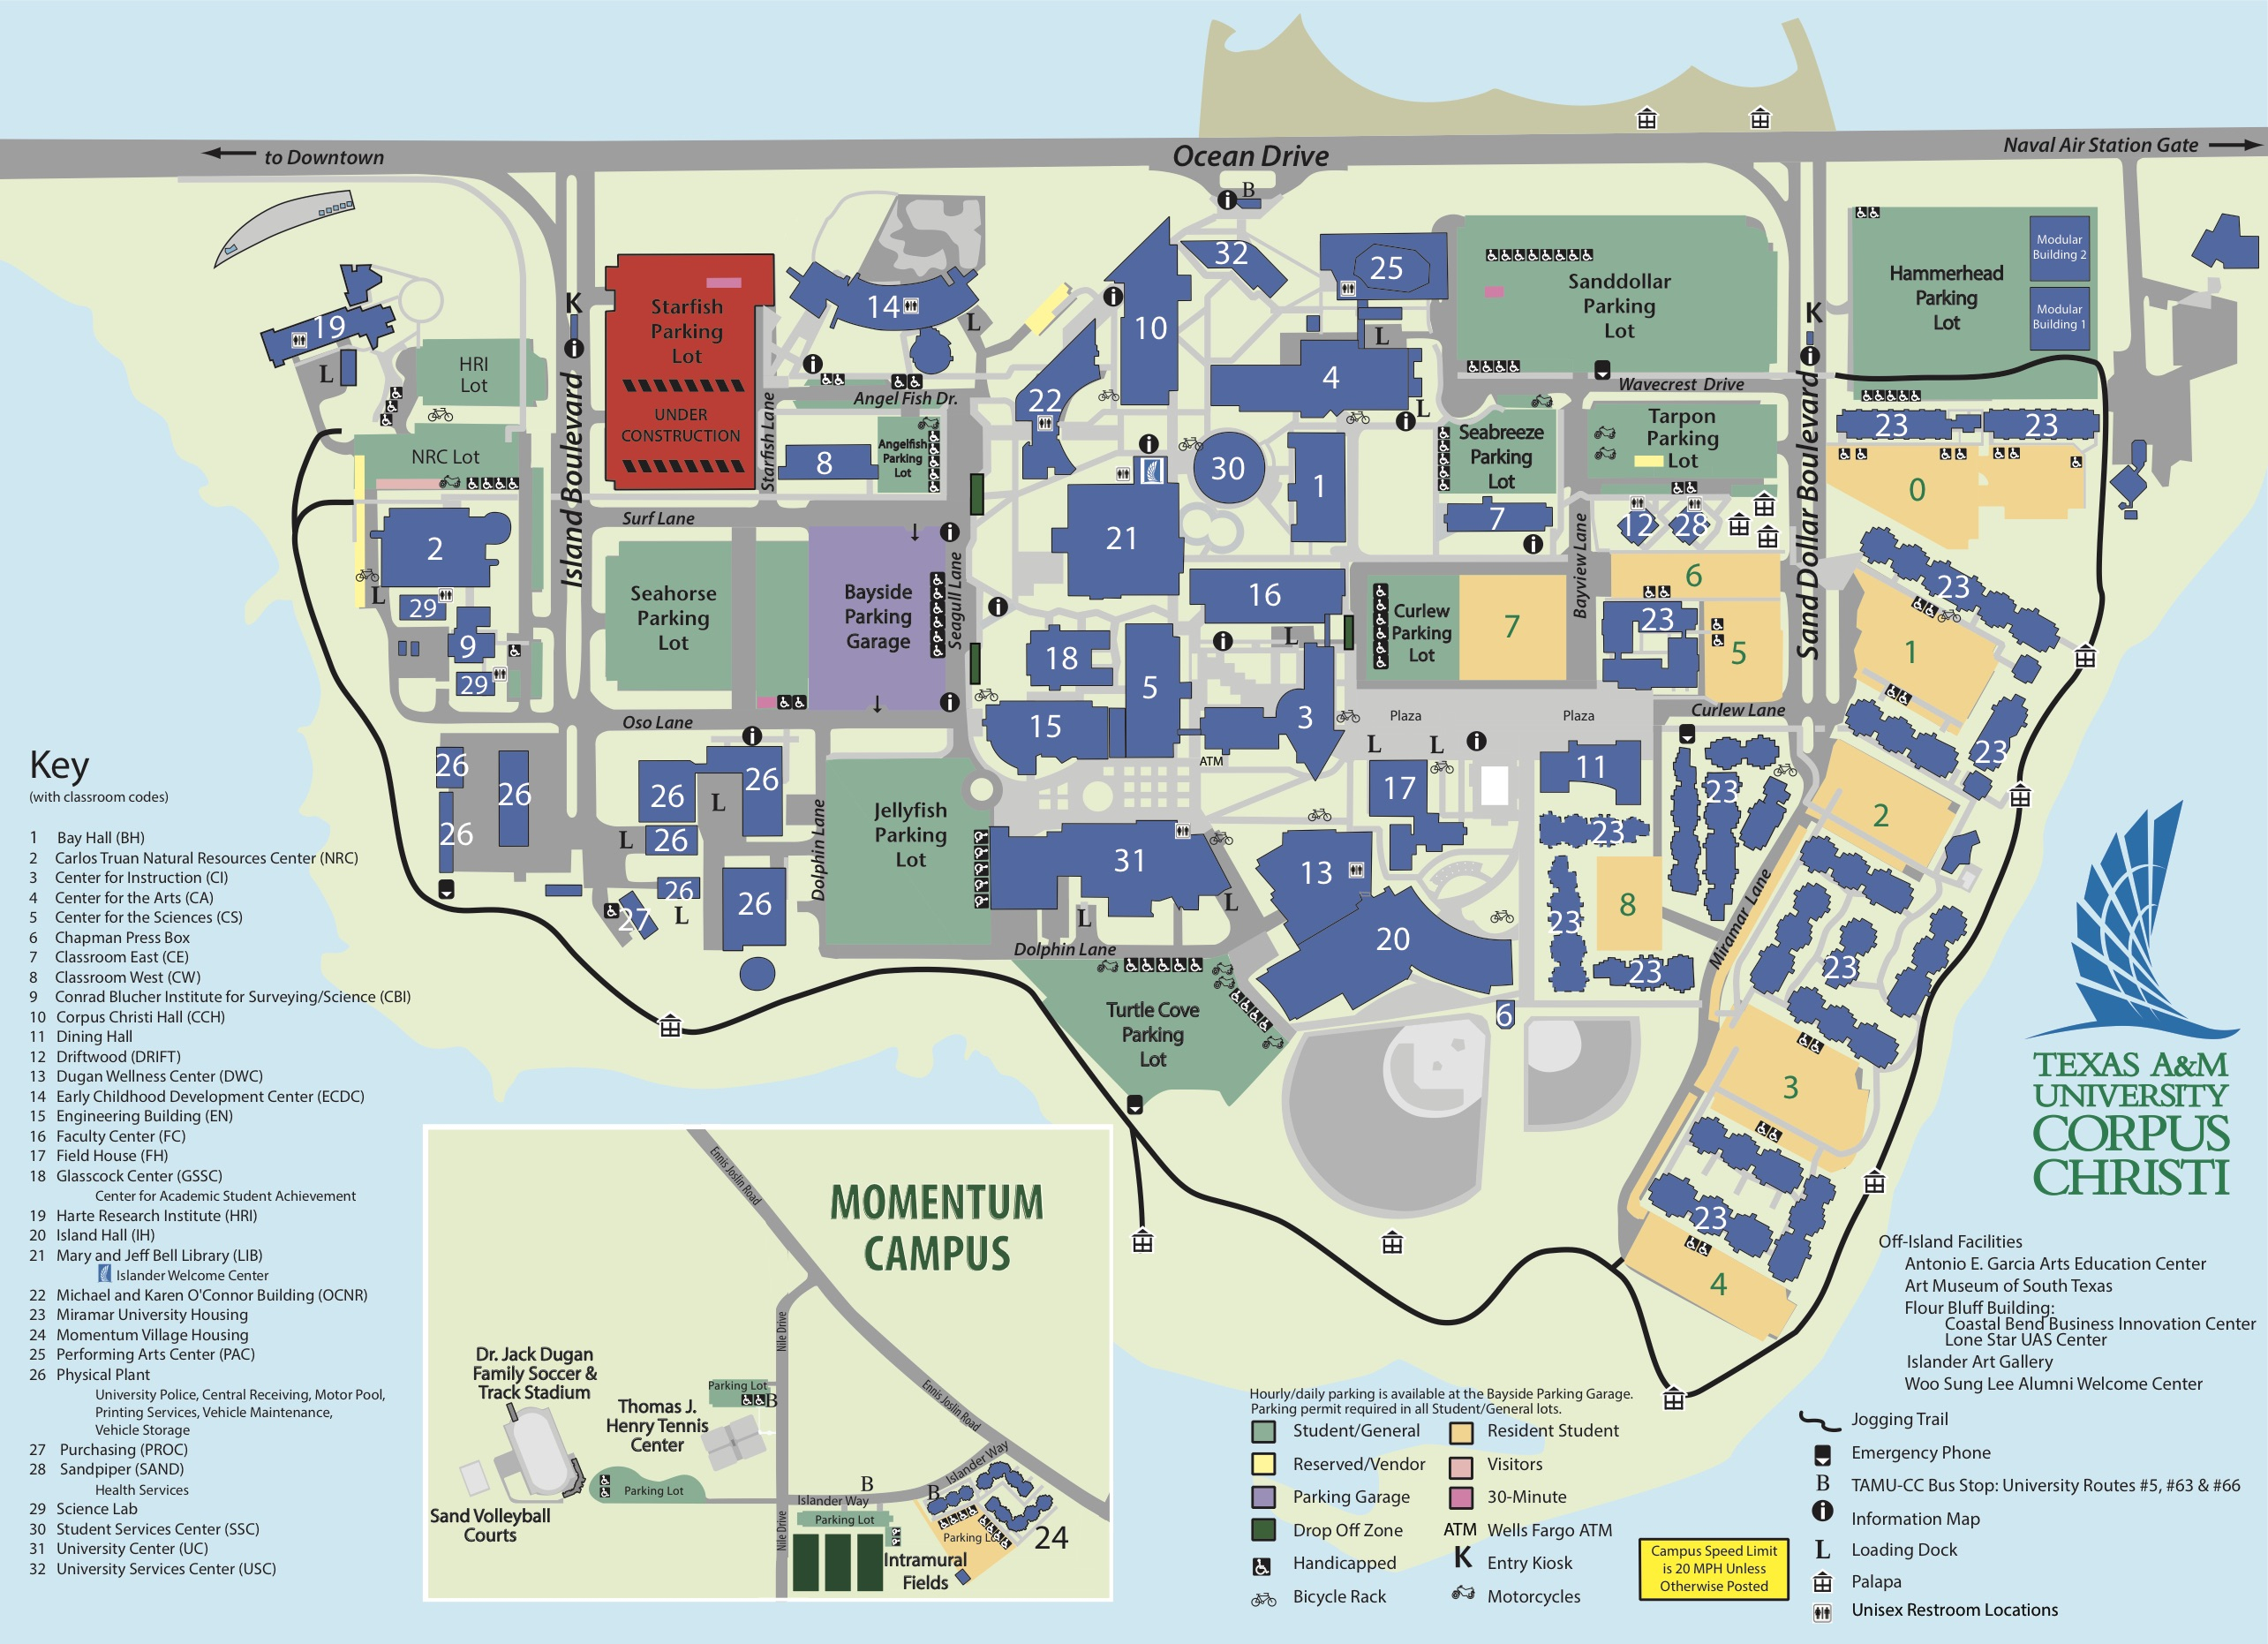 Campus Map Texas A&m University-Corpus Christi - Texas Tech Housing Map